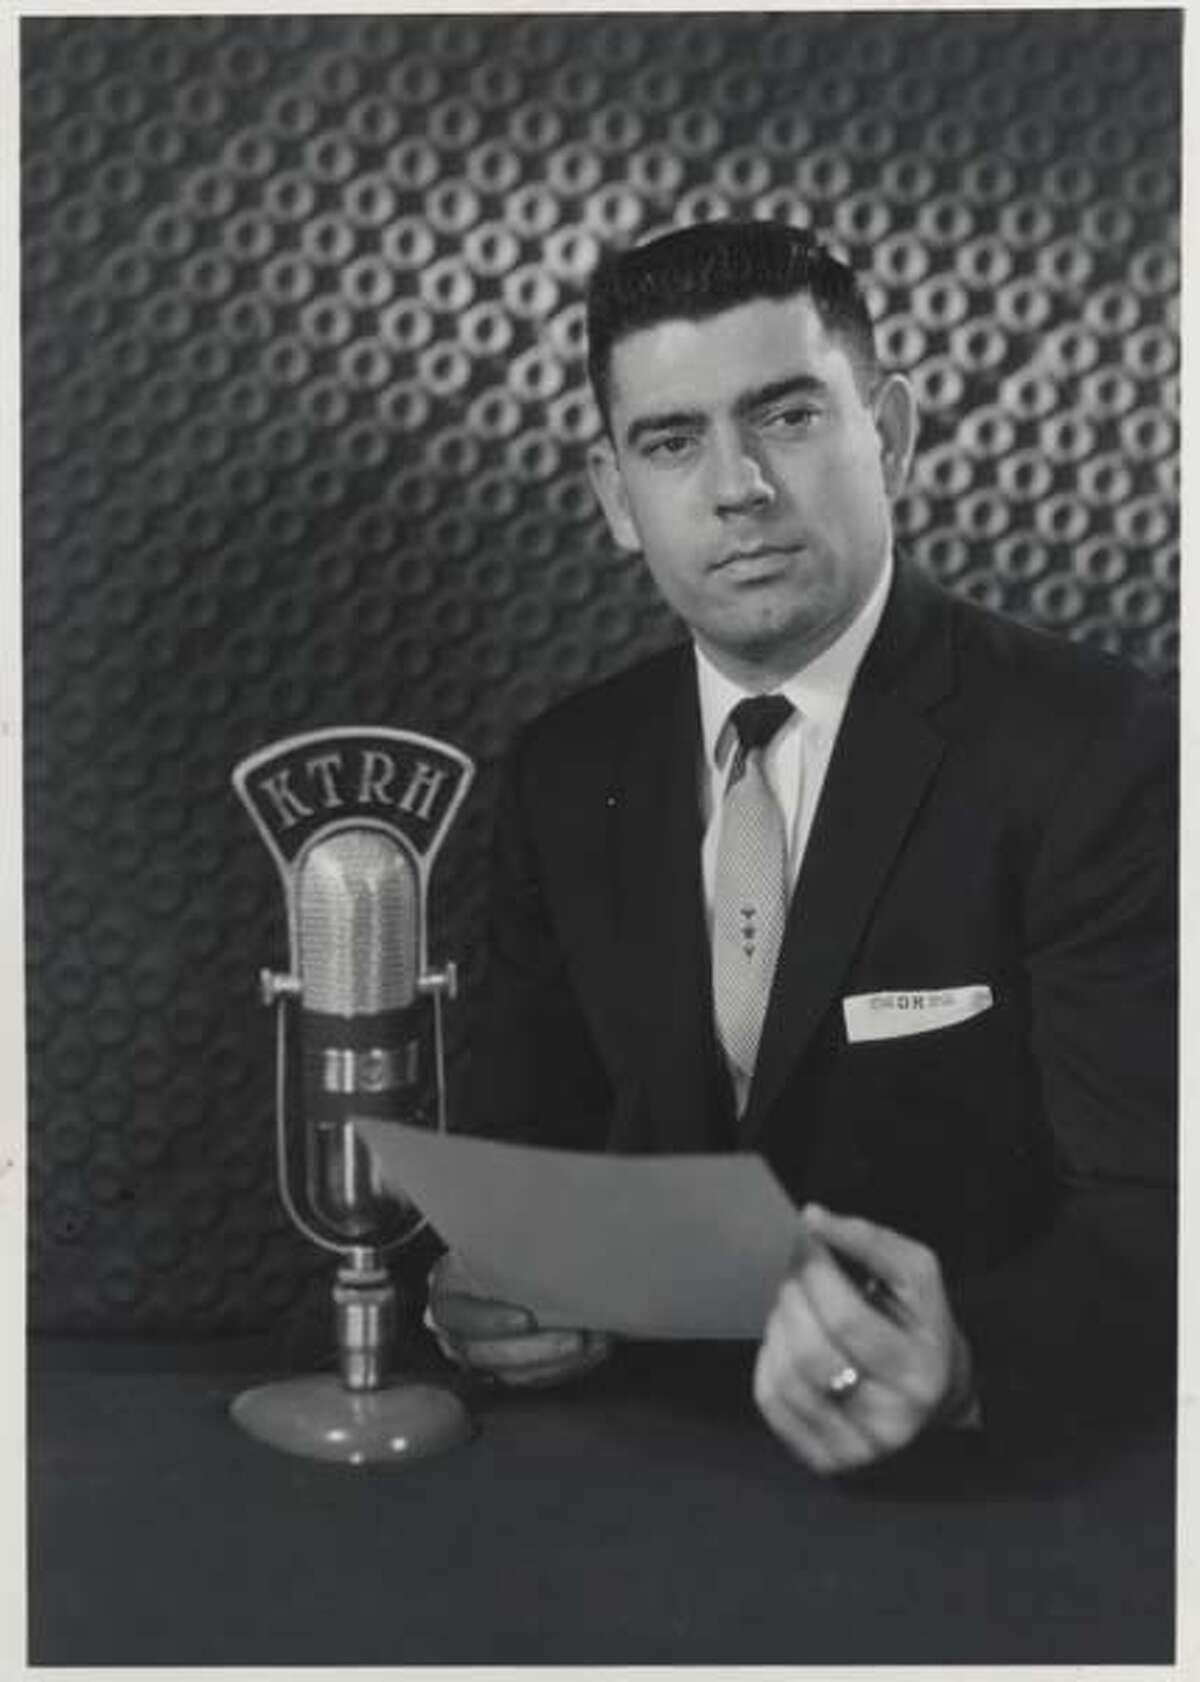 Dan Rather at local Houston radio station KTRH in 1959.